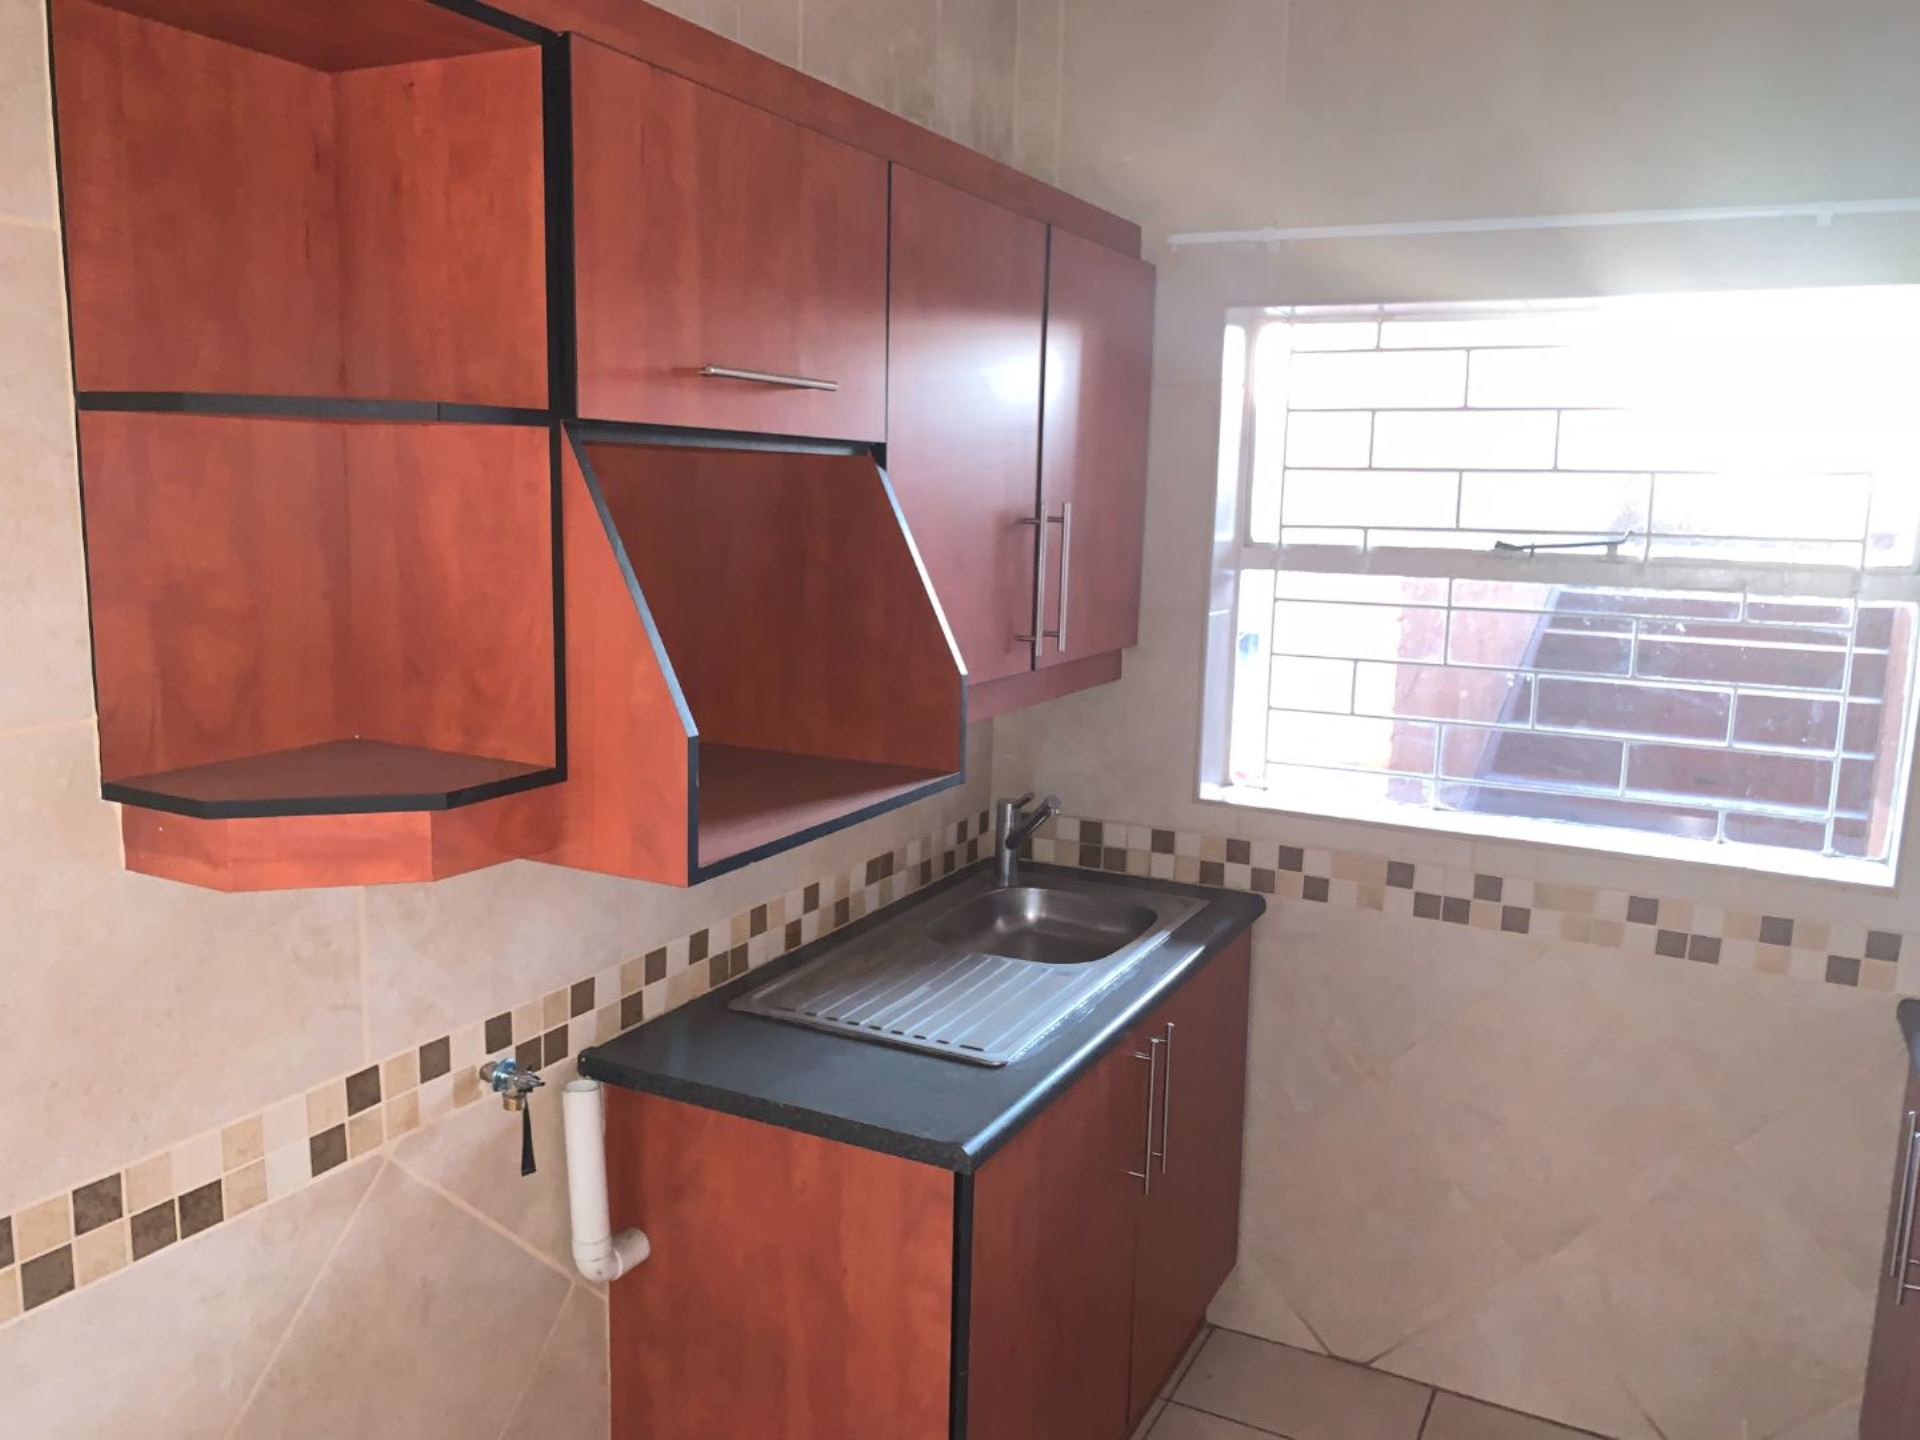 Apartment Rental Monthly in ALBERTON NORTH